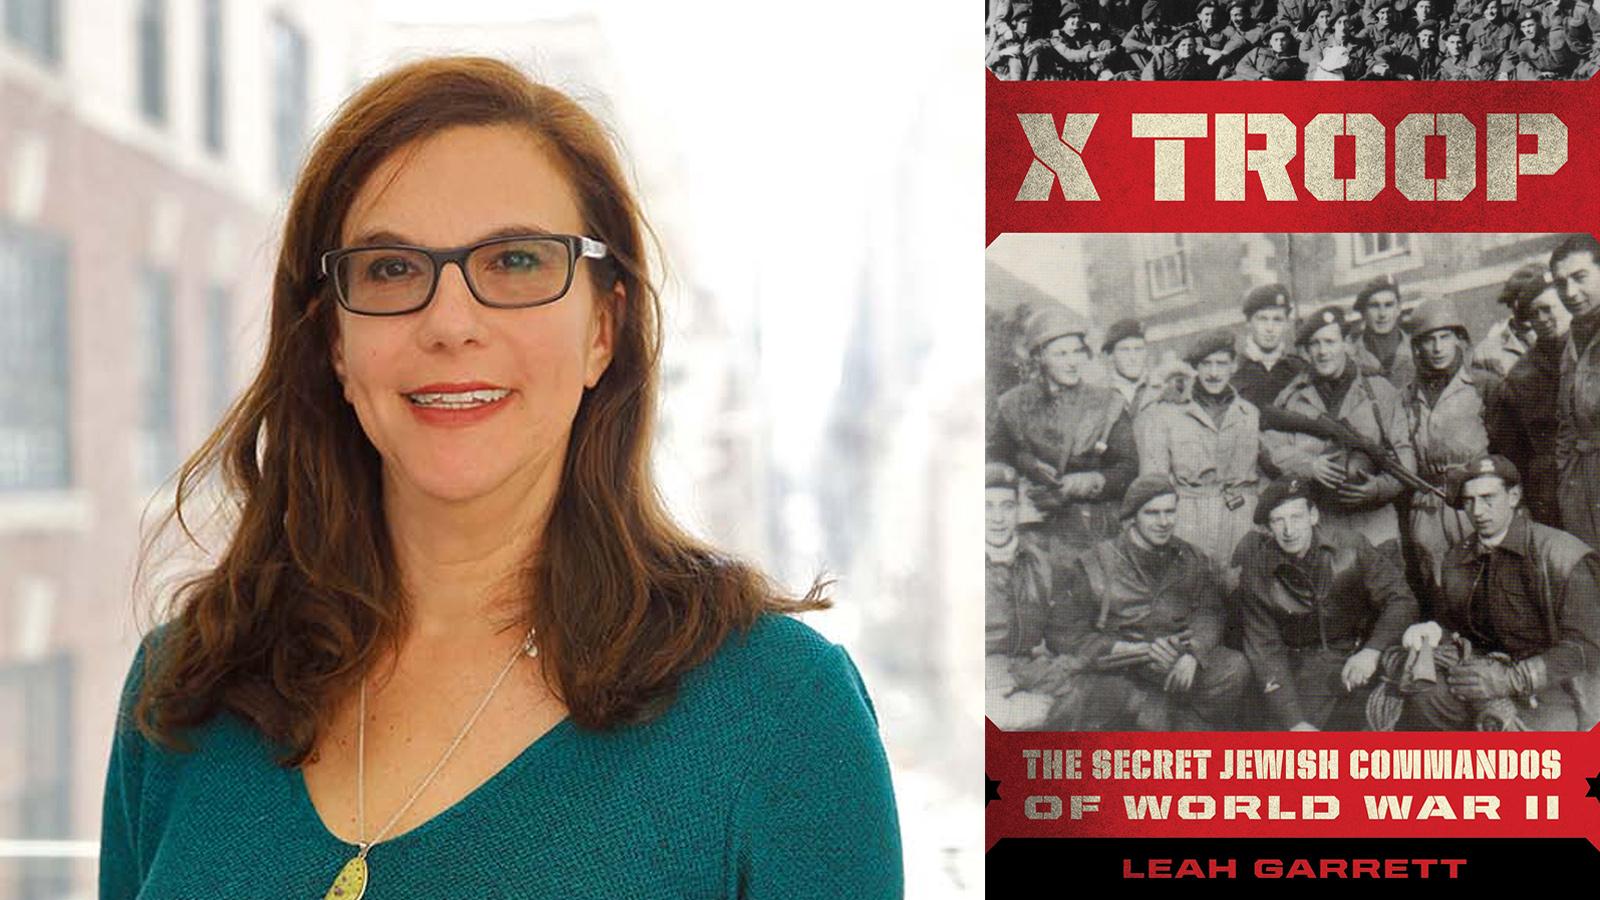 Leah Garrett and her book X troop